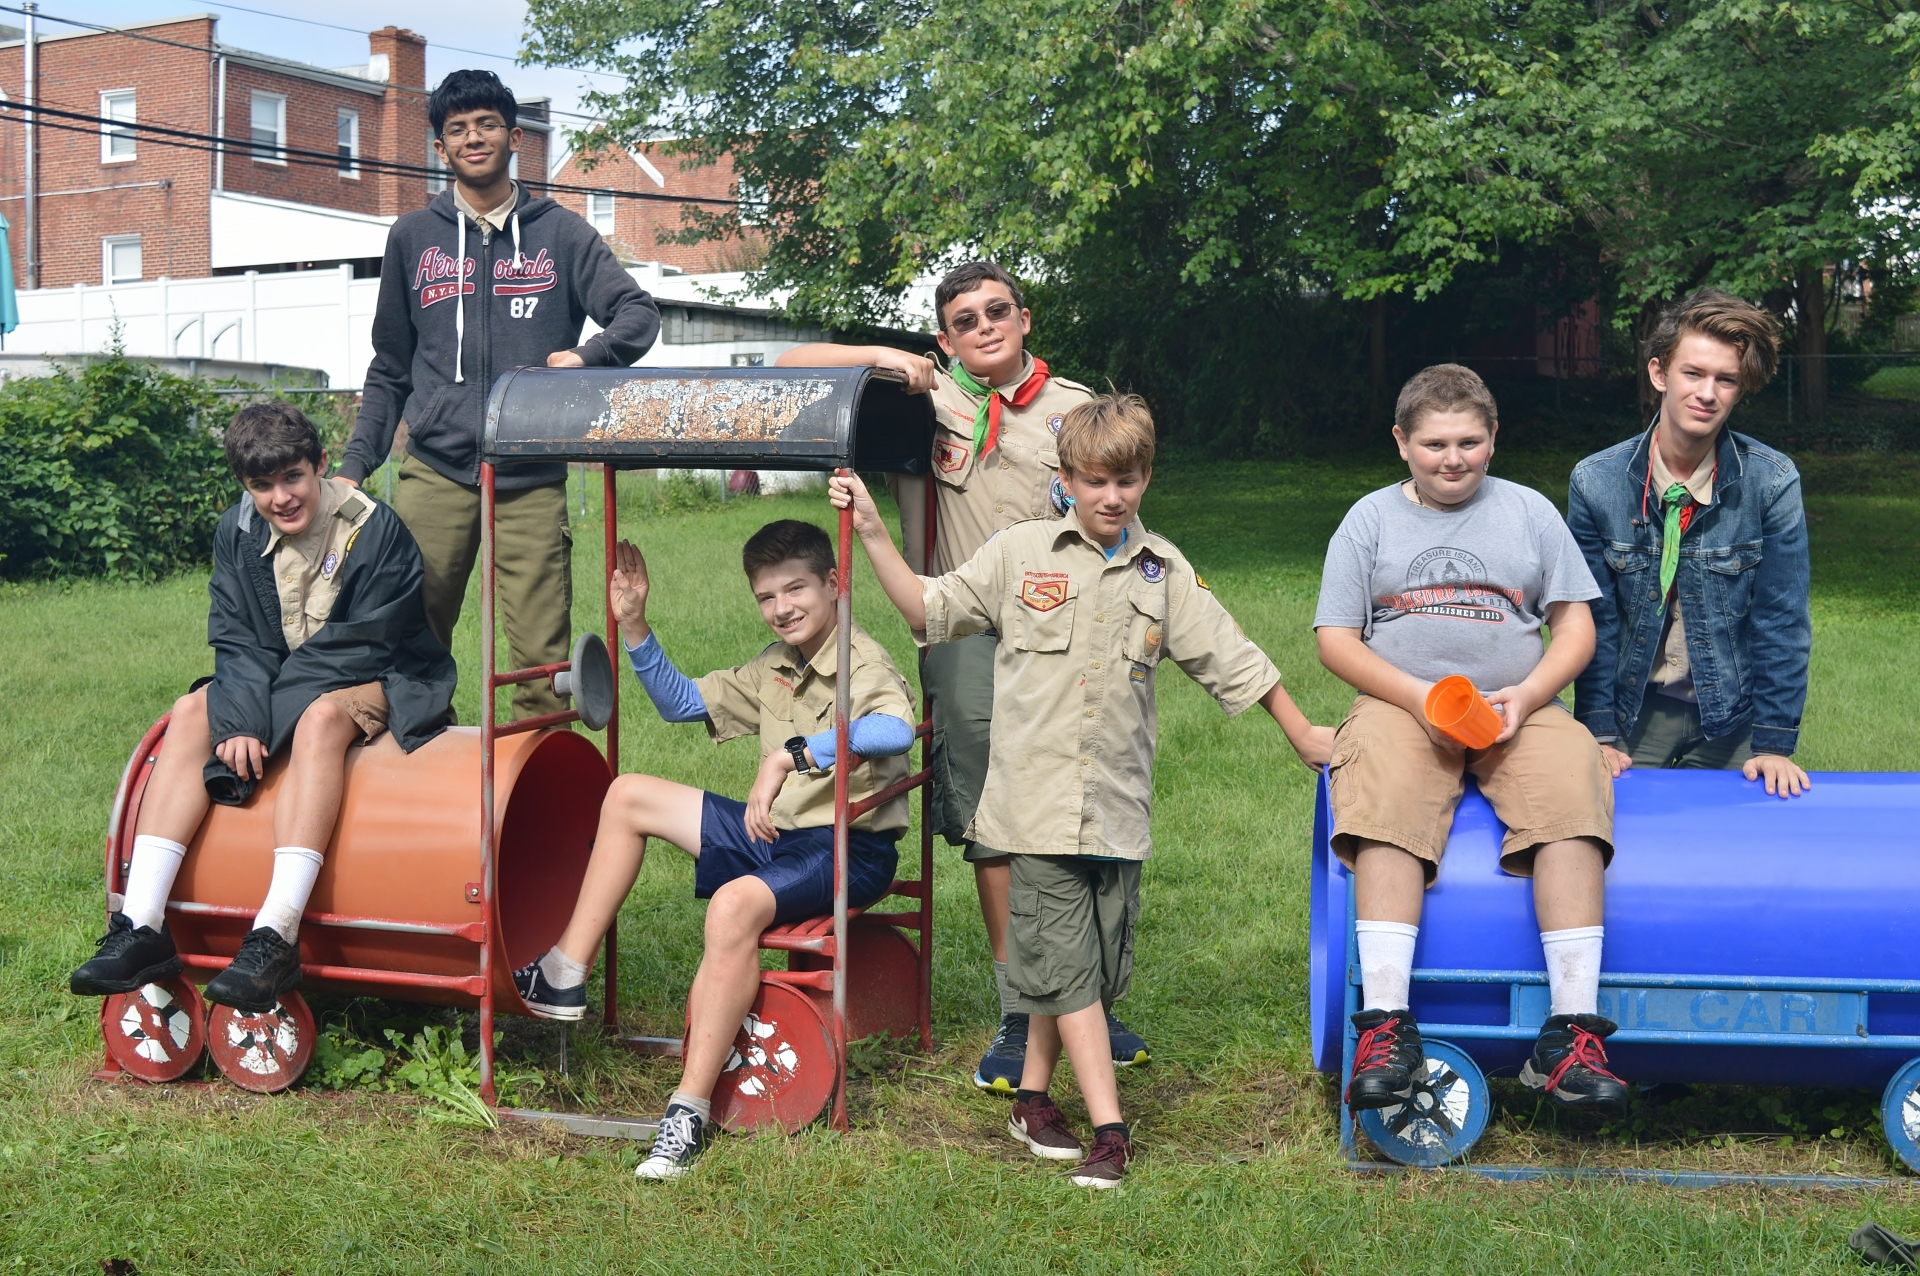 Community Day - Sept. 15, 2018